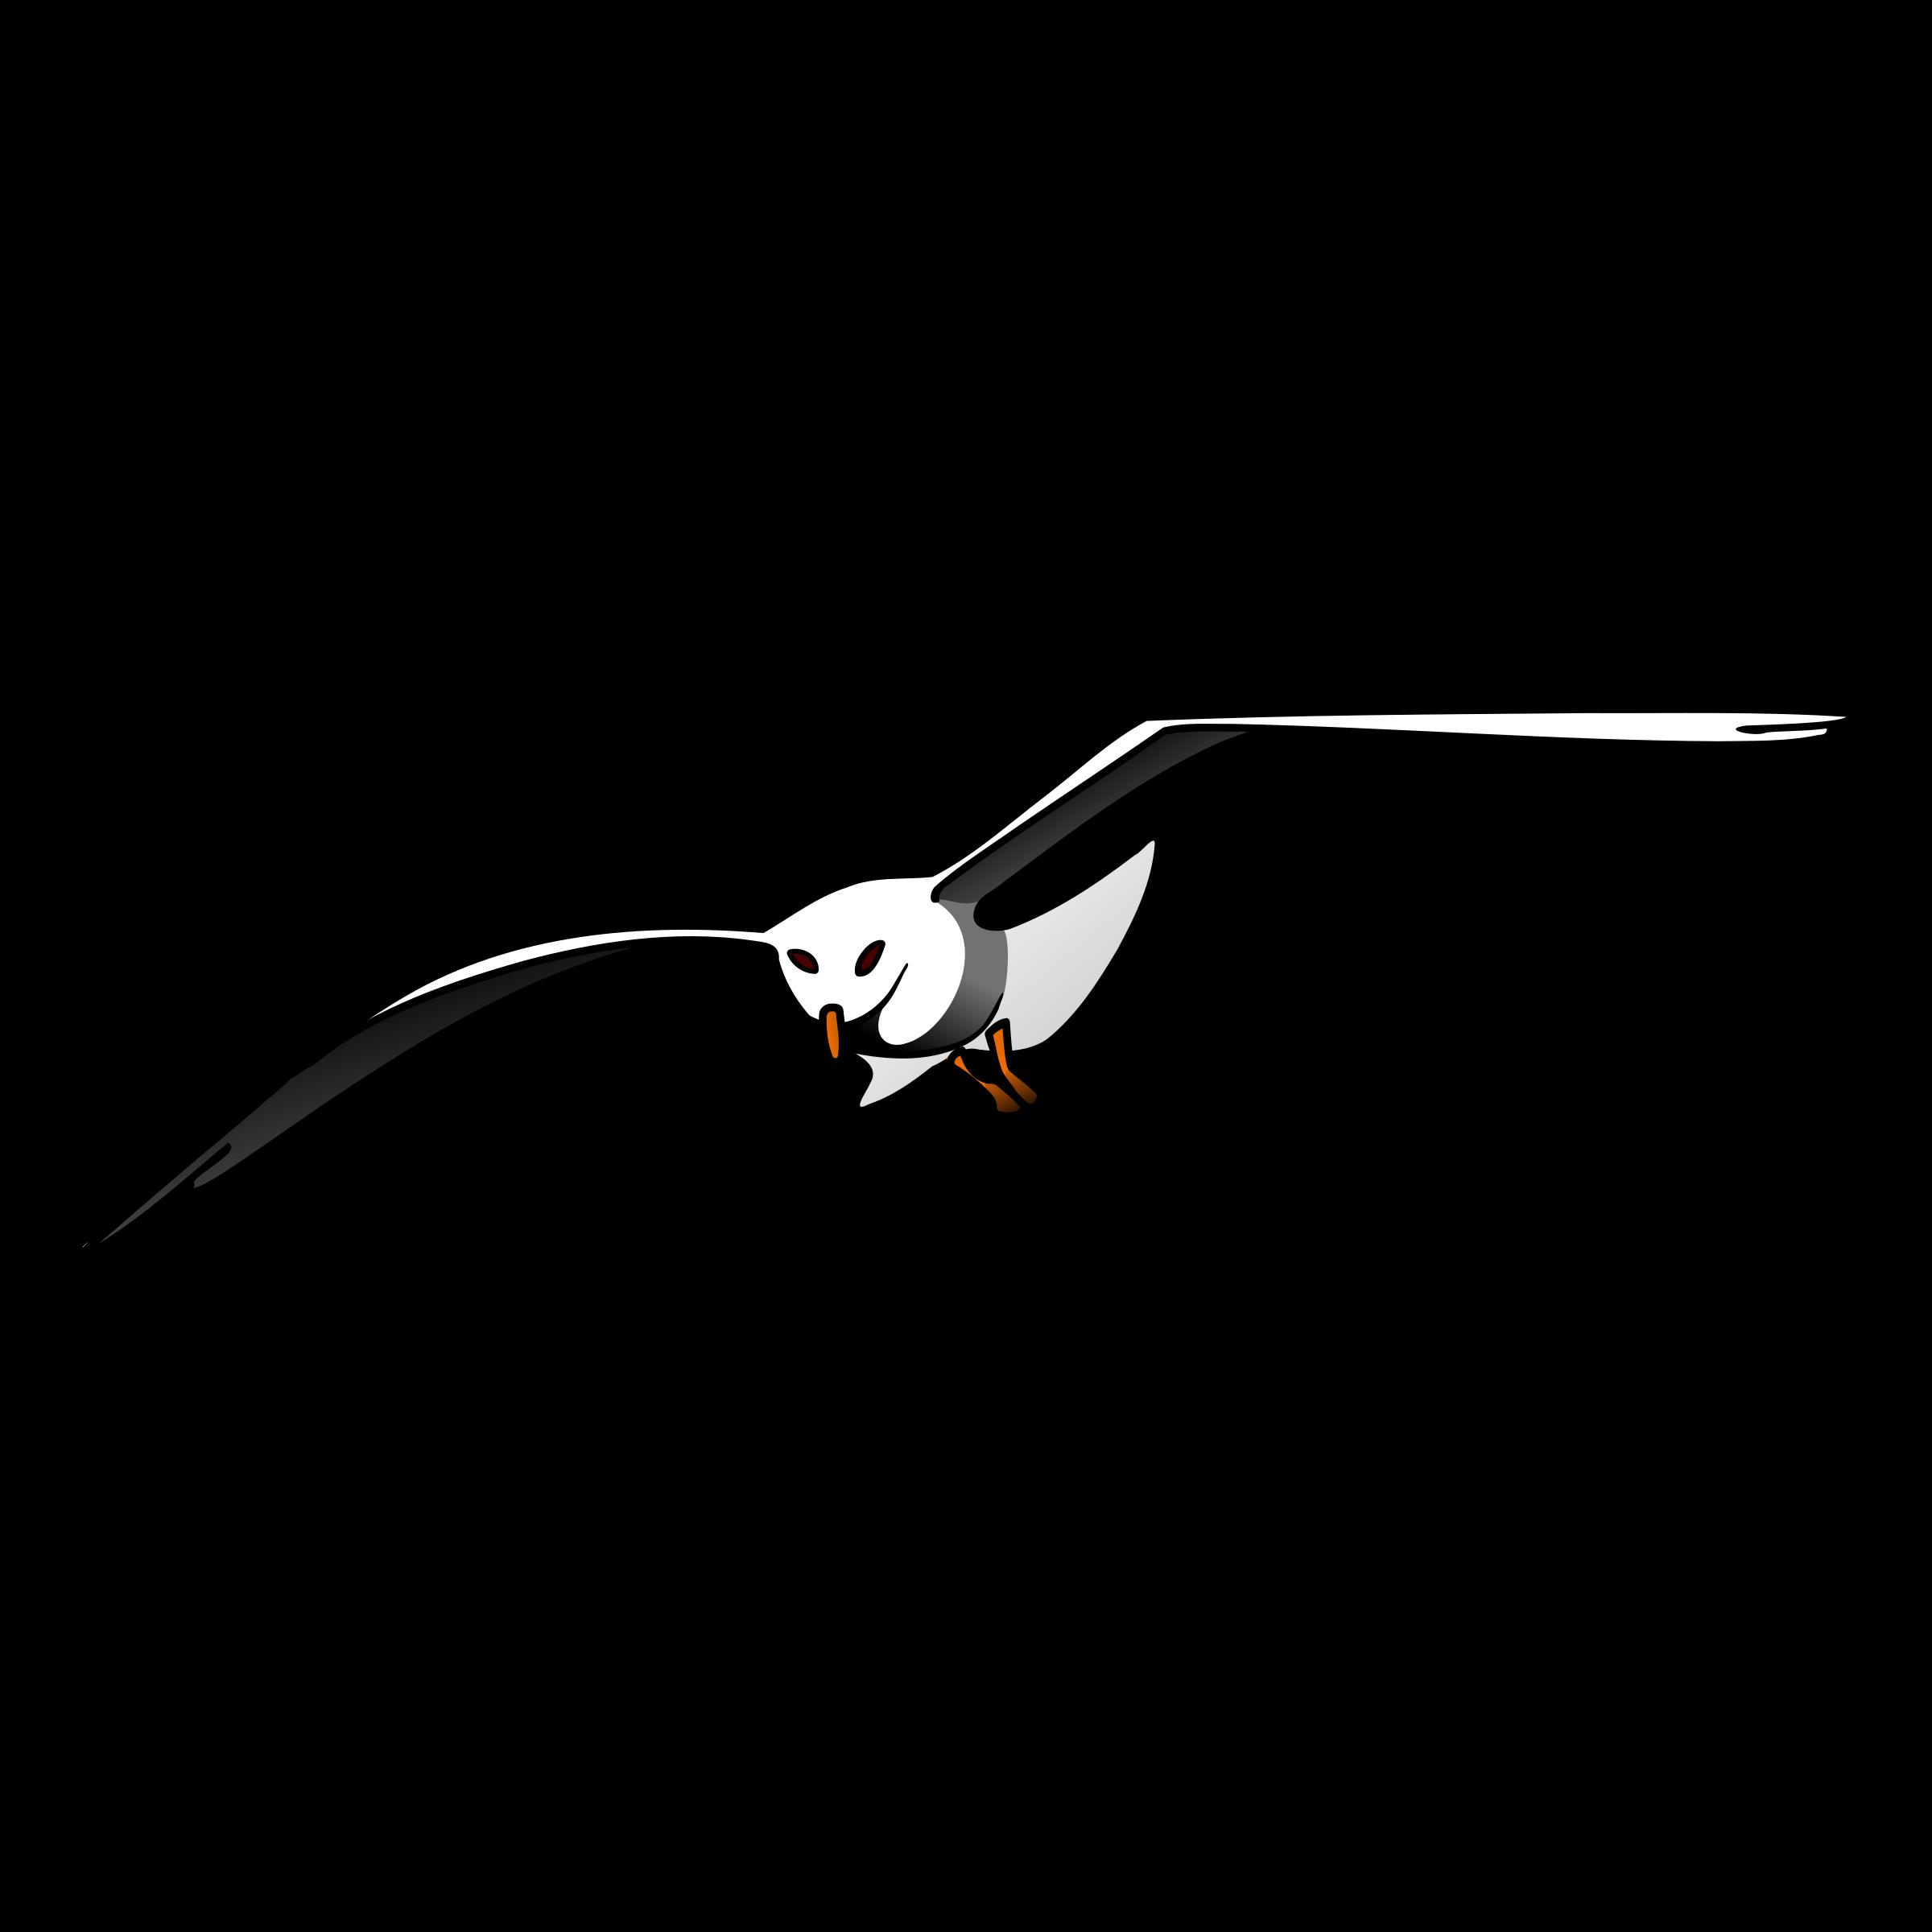 Seagull clipart transparent #12